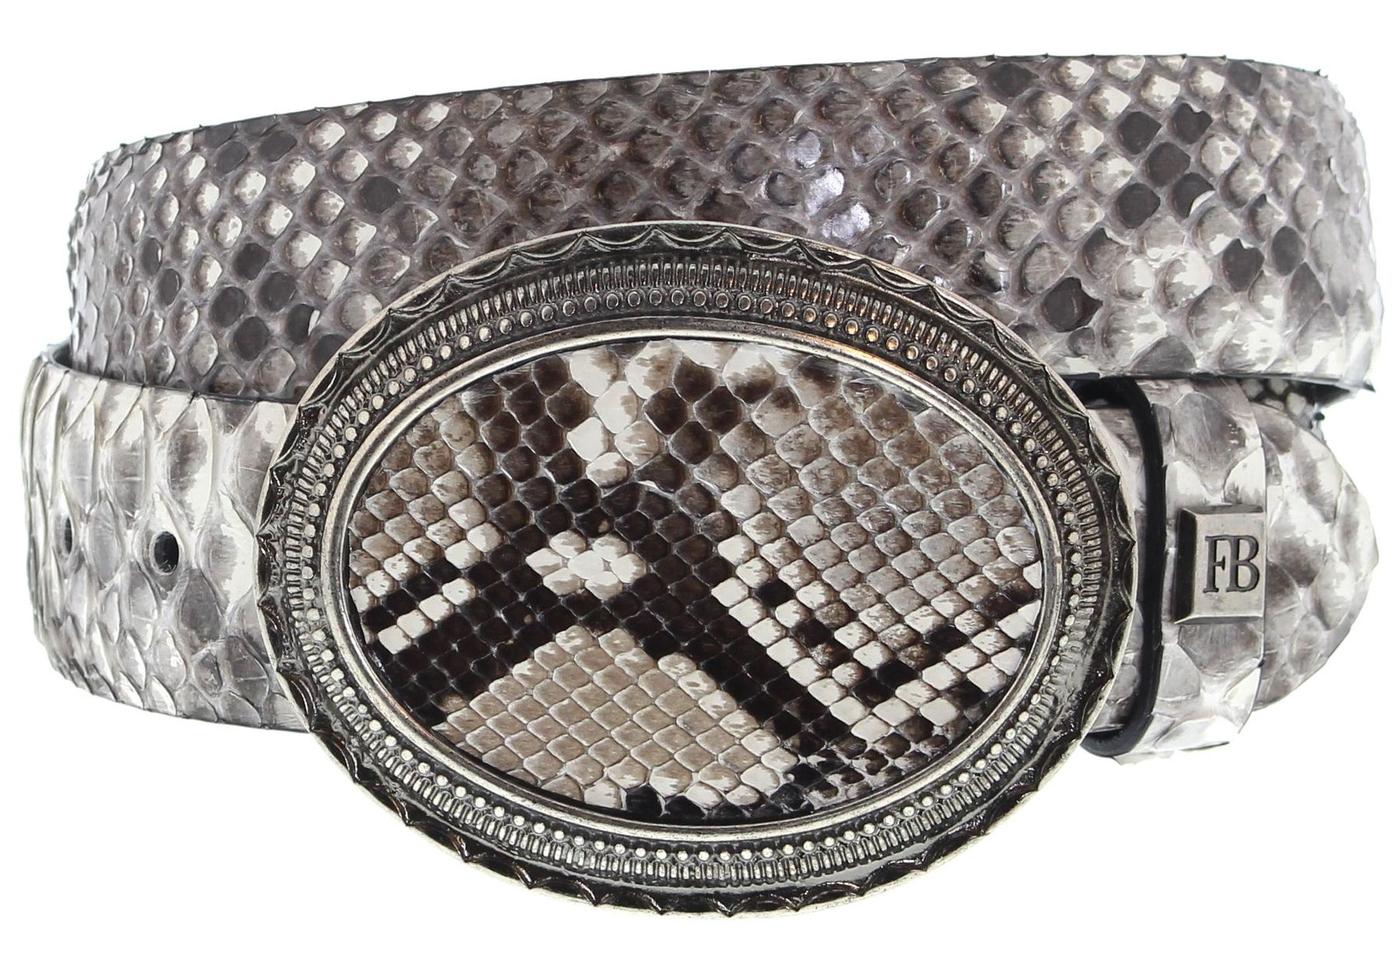 FB Fashion Boots FG5845 Piton Adria Exotic Belt - white